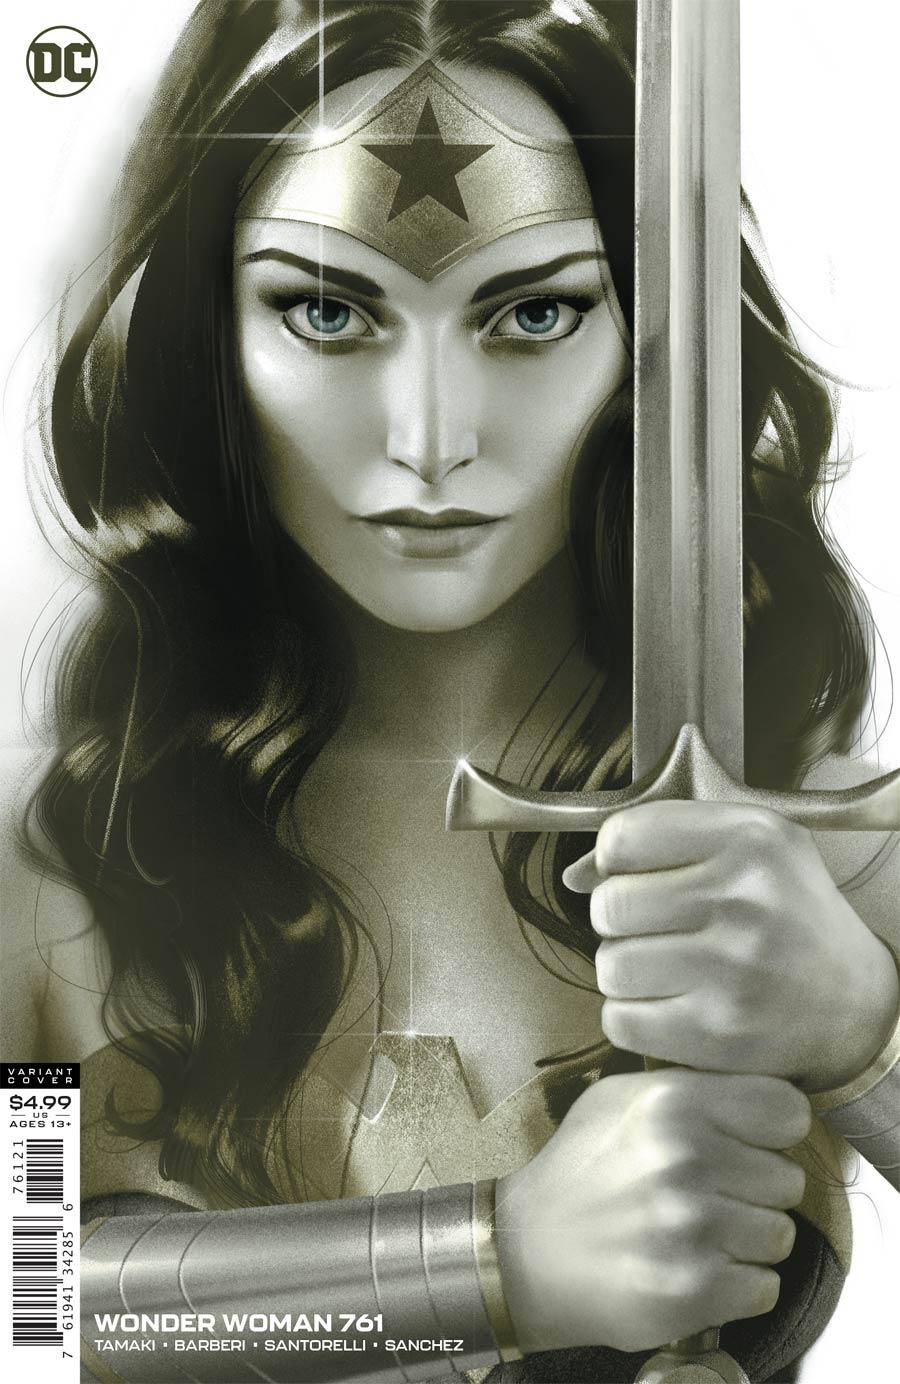 Wonder Woman Vol 5 #761 Cover B Variant Joshua Middleton Card Stock Cover